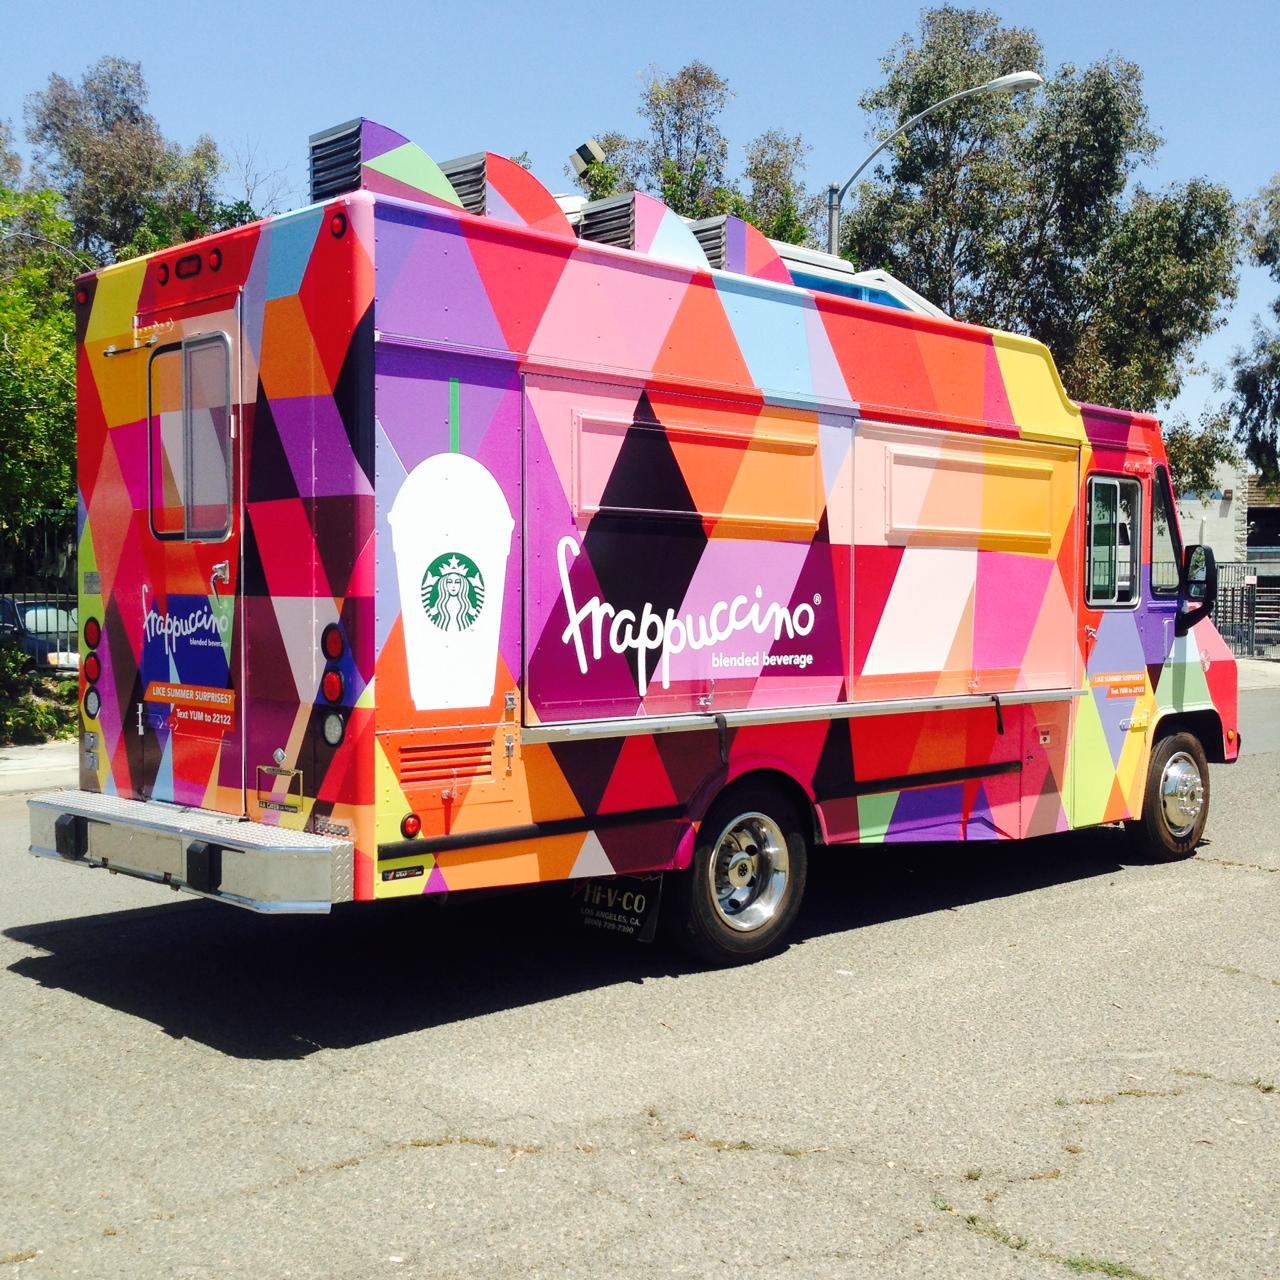 Starbucks Picture.JPG